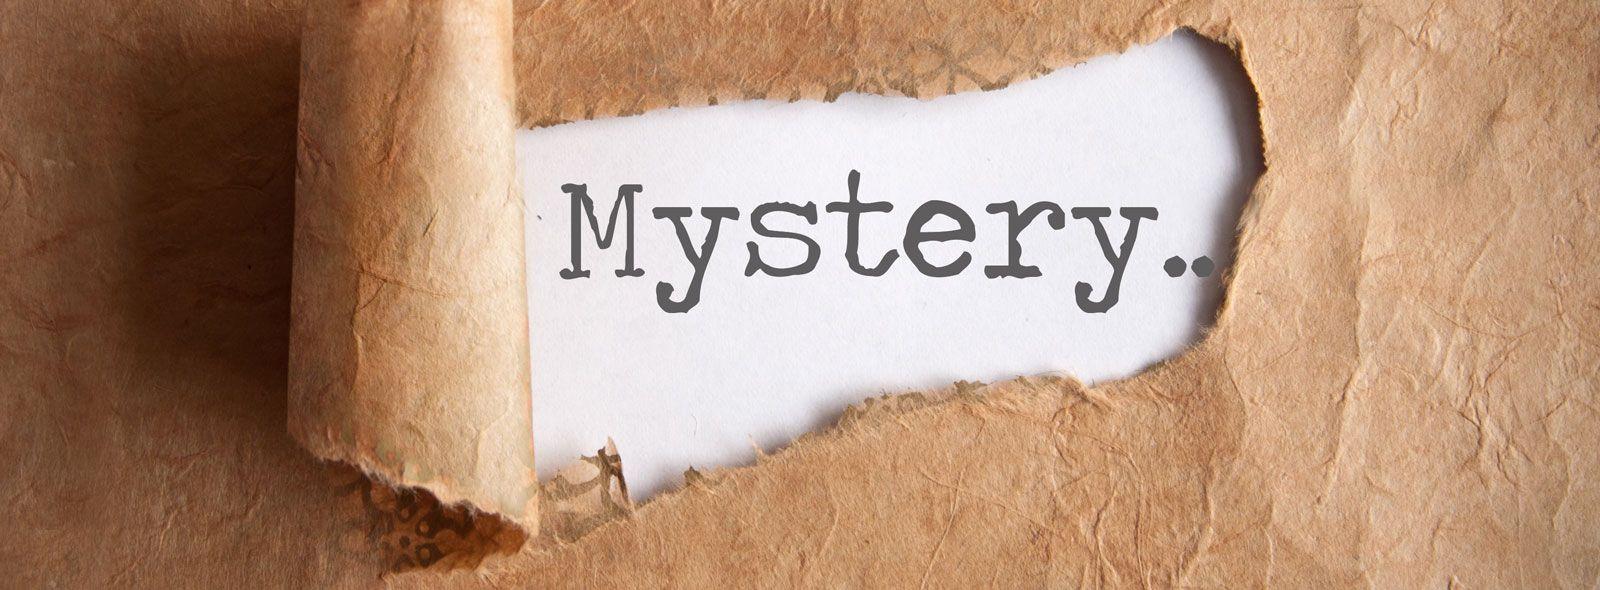 Misteri inspiegabili